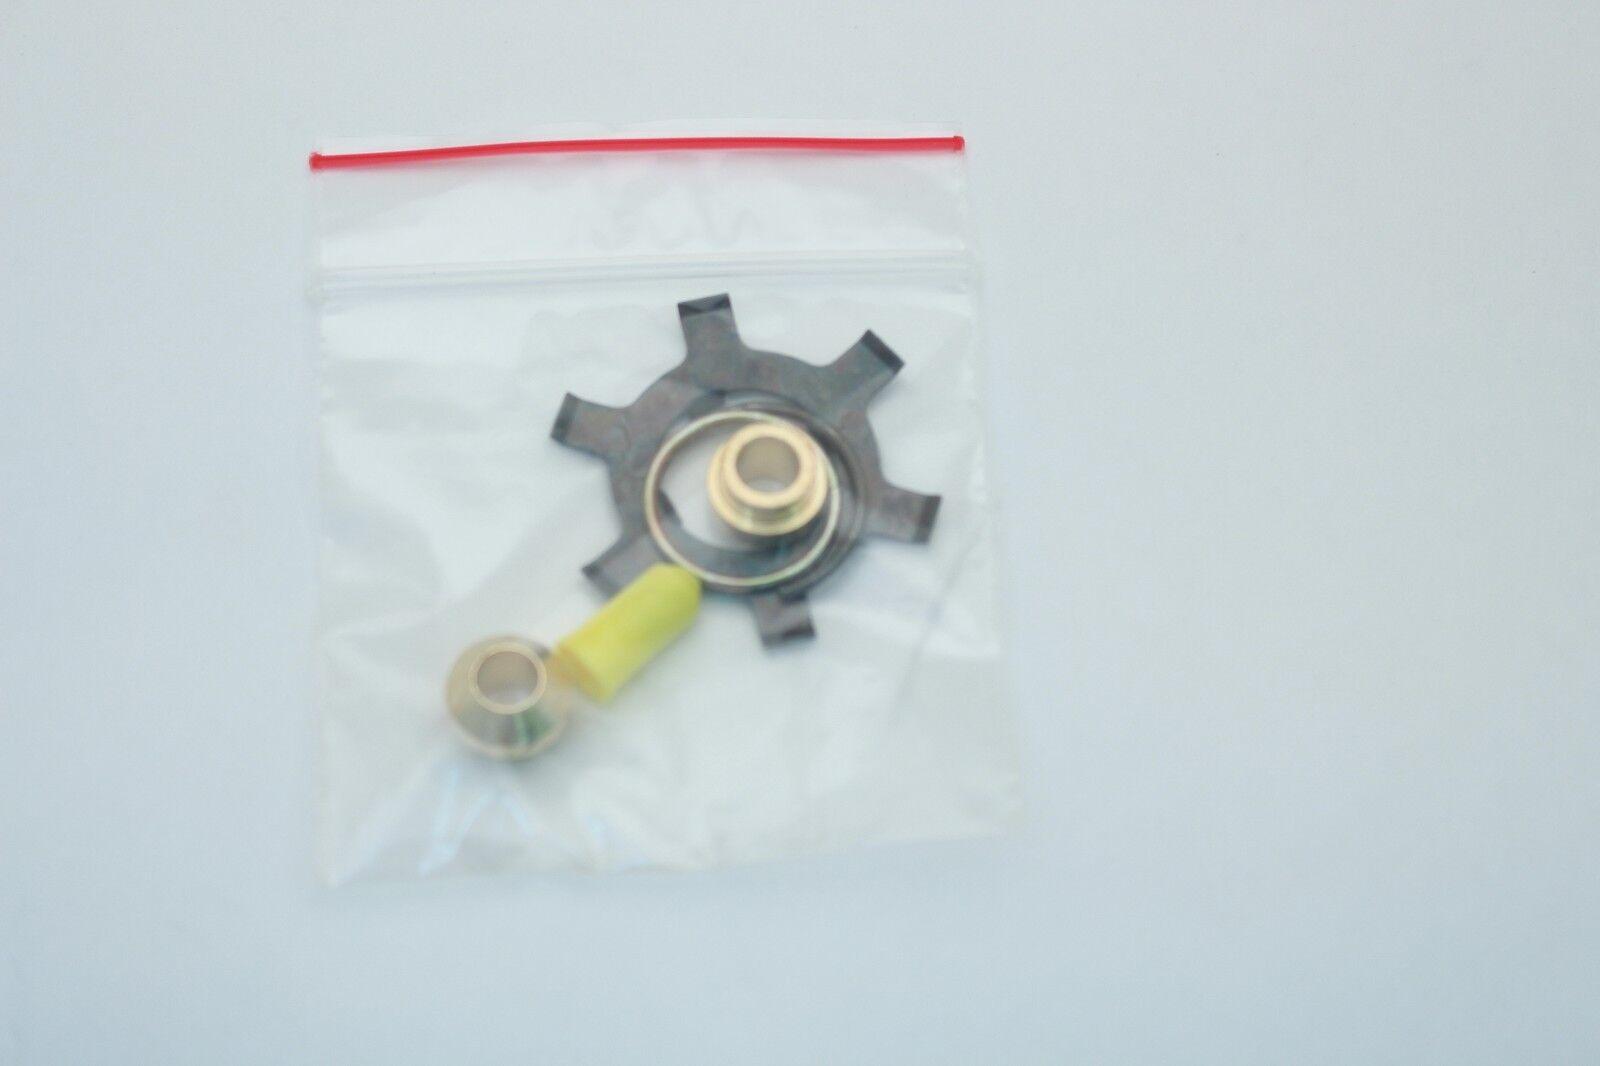 Duramax Diesel Hydro-Boost Repair Kit (Mostly Rubber) Kit ...